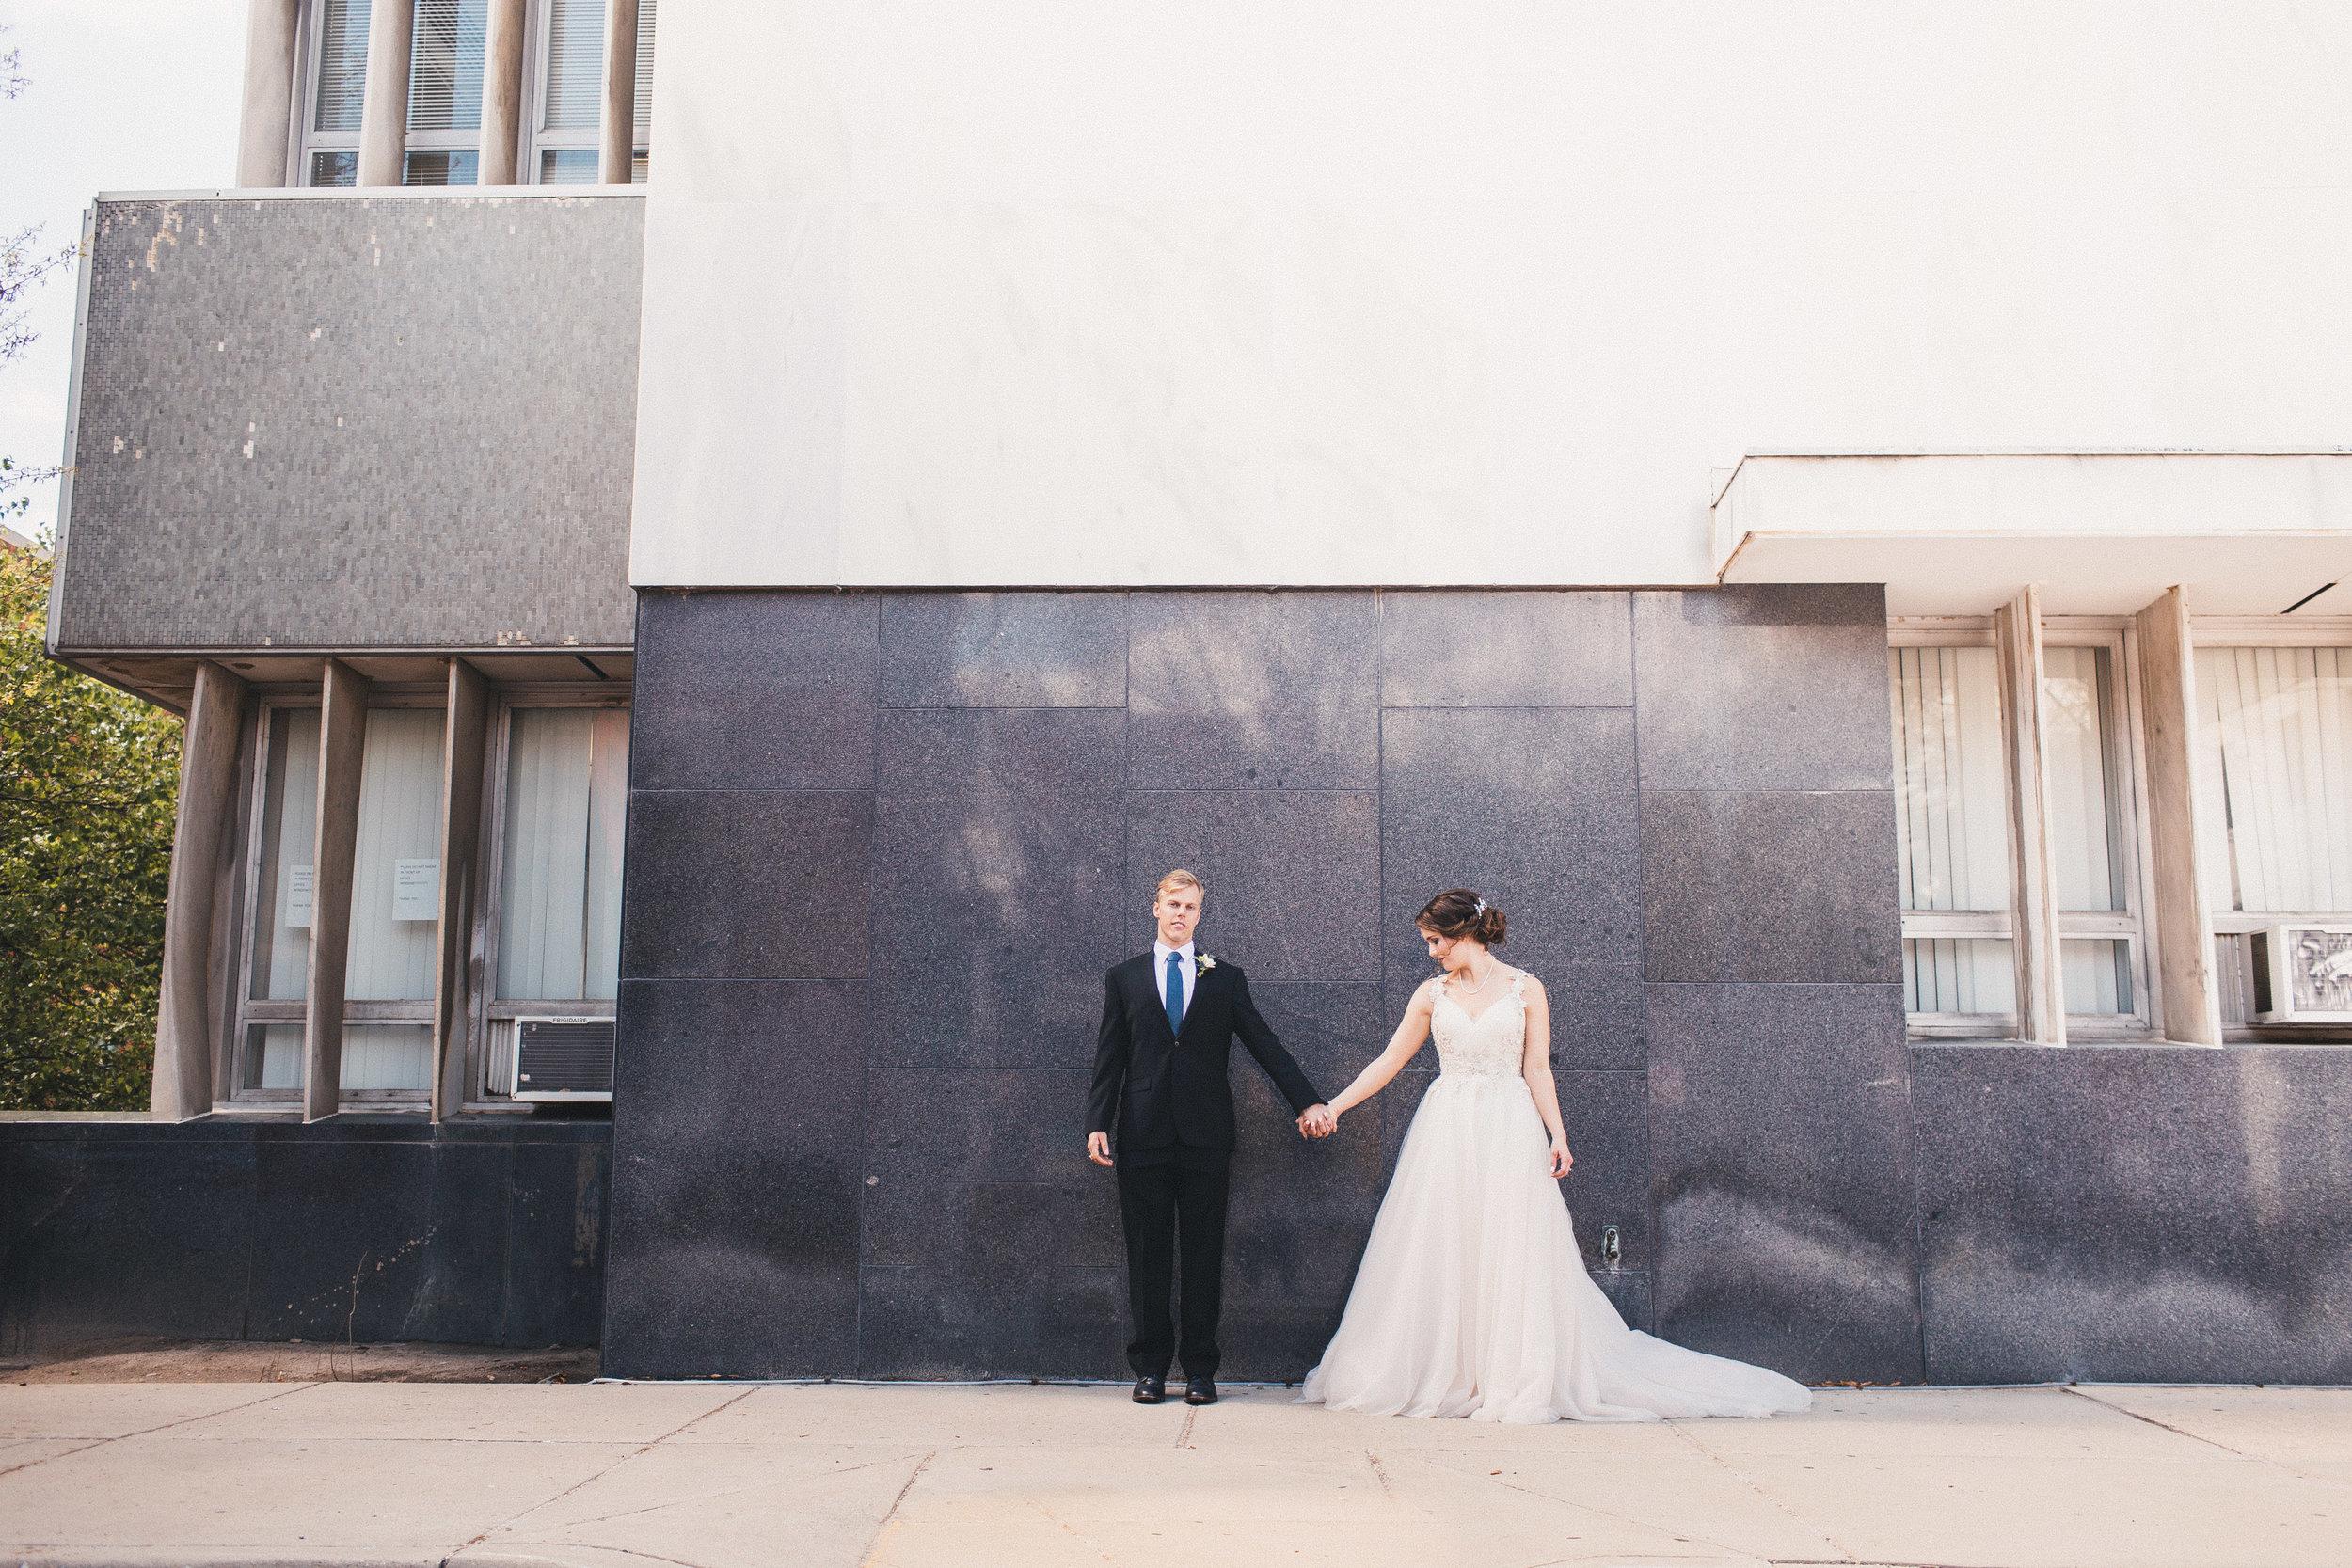 Lindsey & Bert - Wedding 4.1.17-365.jpg